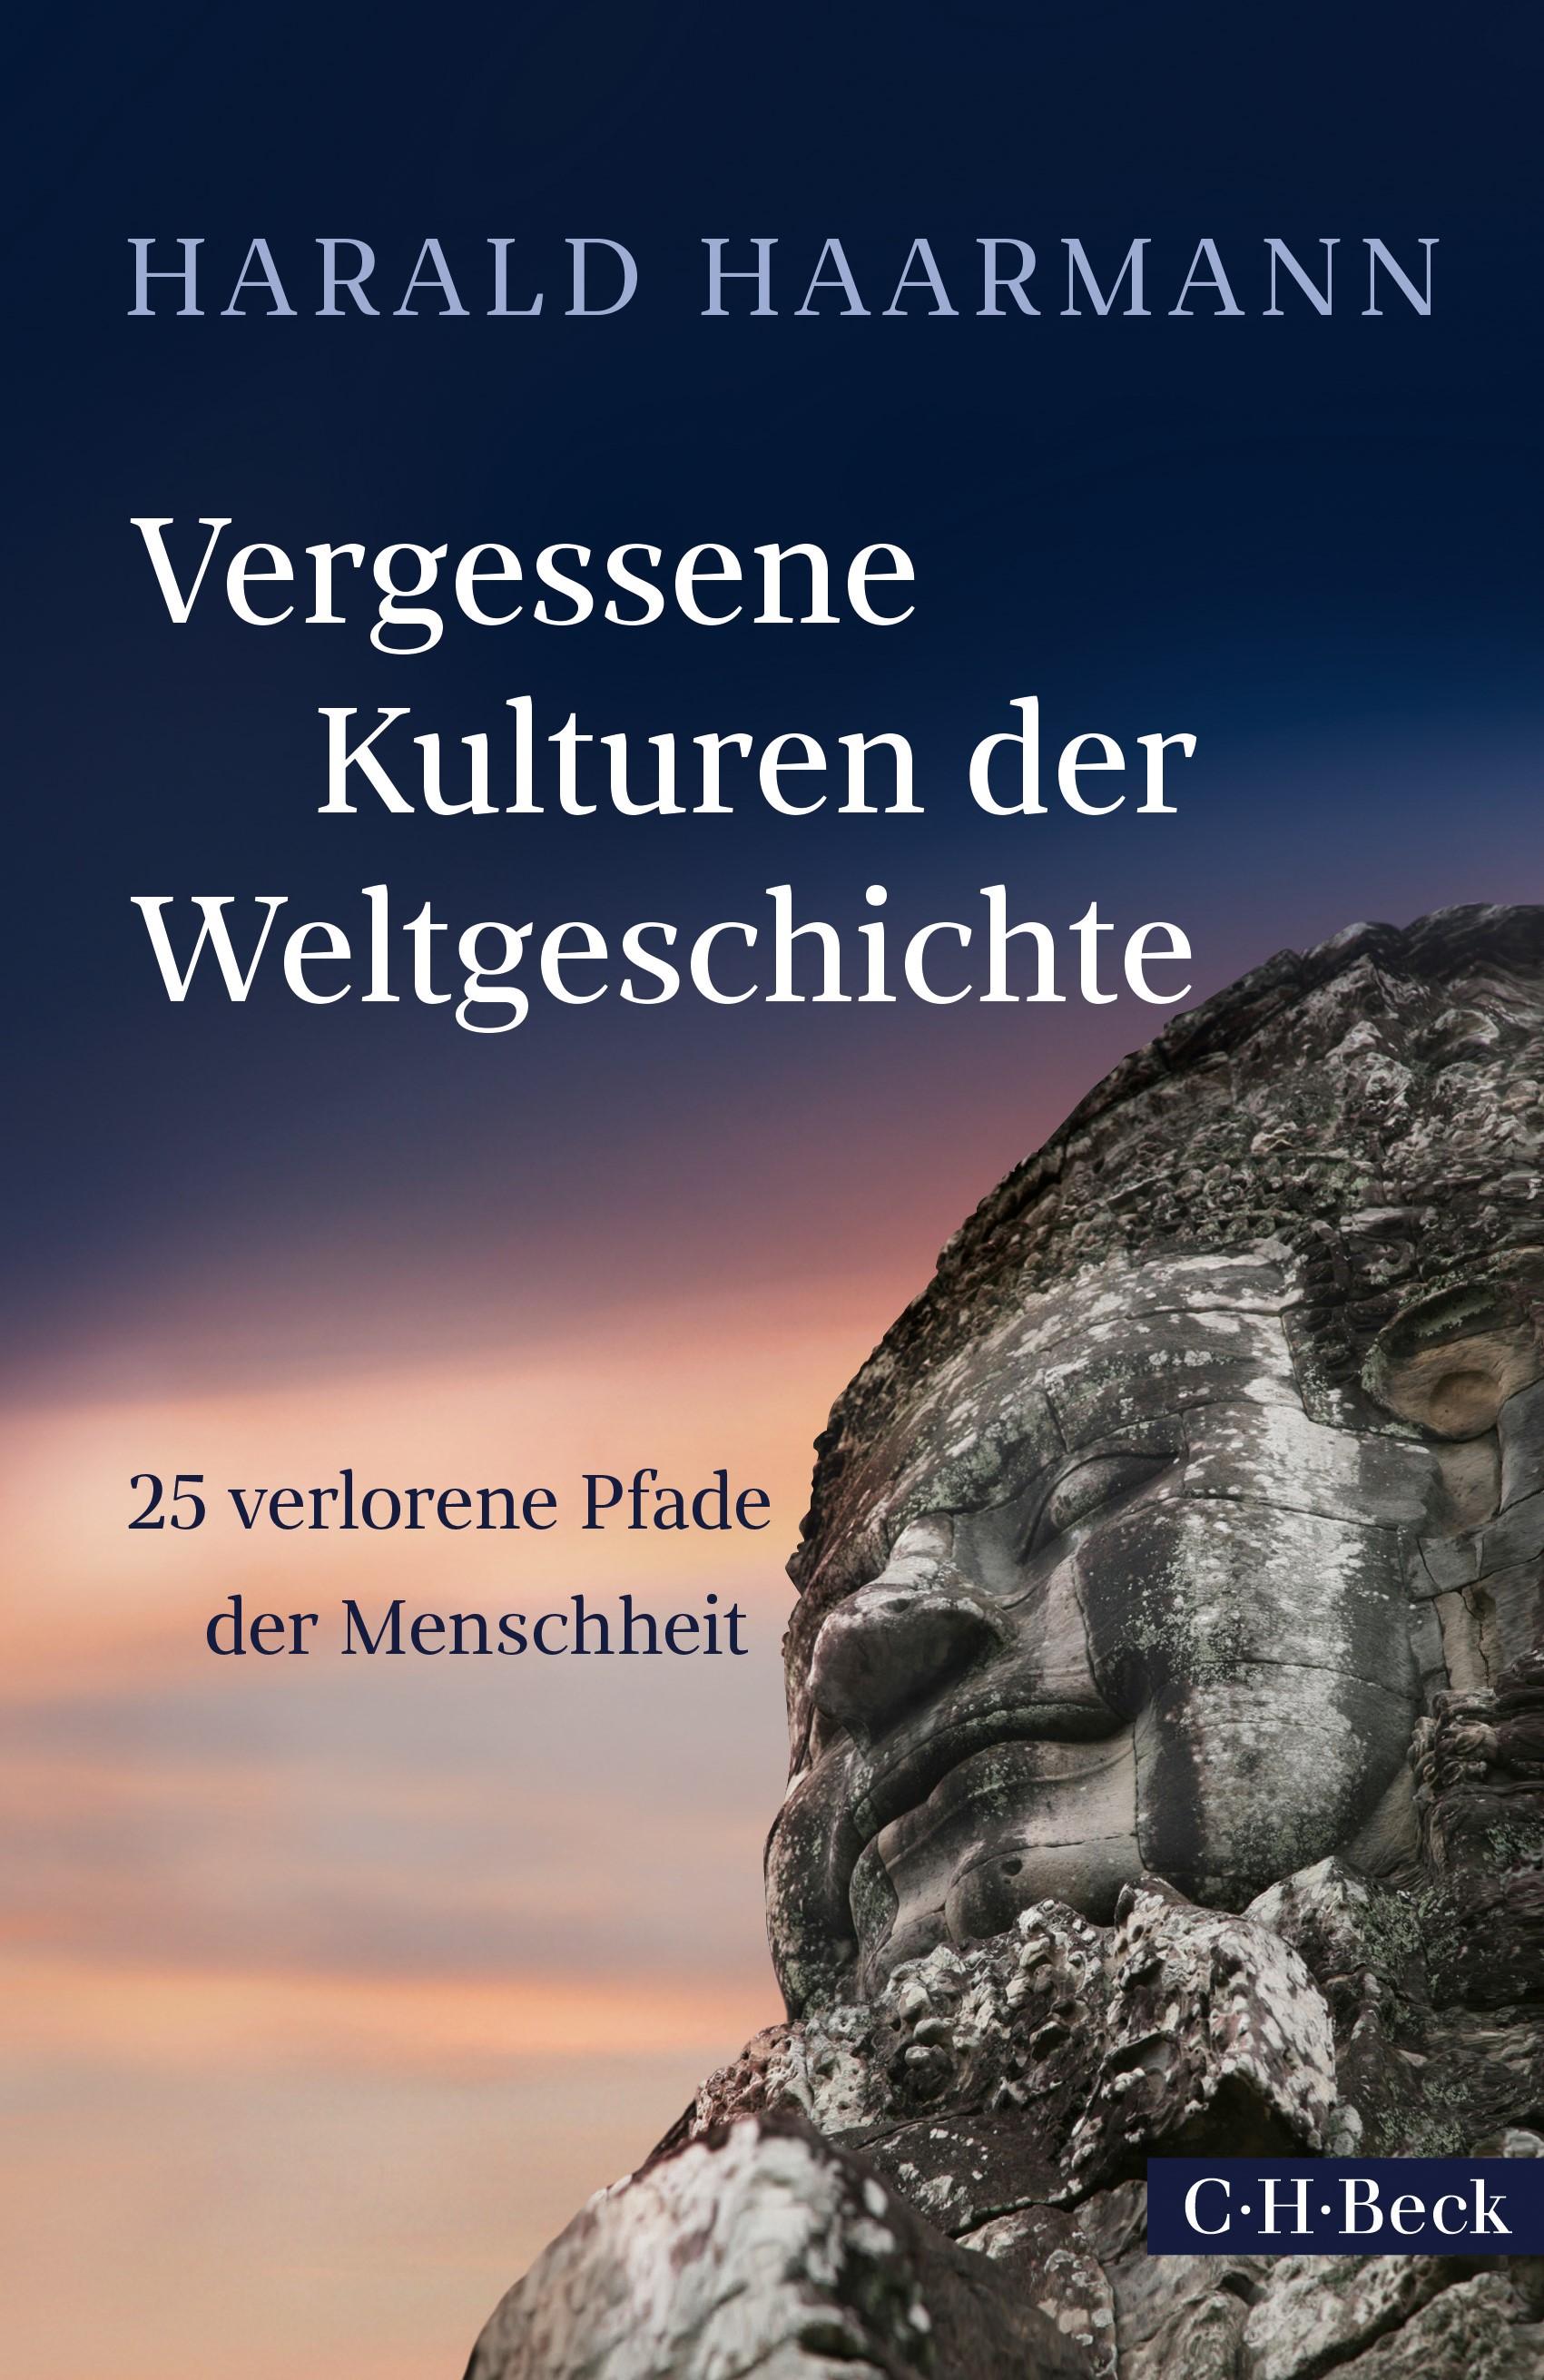 Vergessene Kulturen der Weltgeschichte | Haarmann, Harald, 2019 | Buch (Cover)